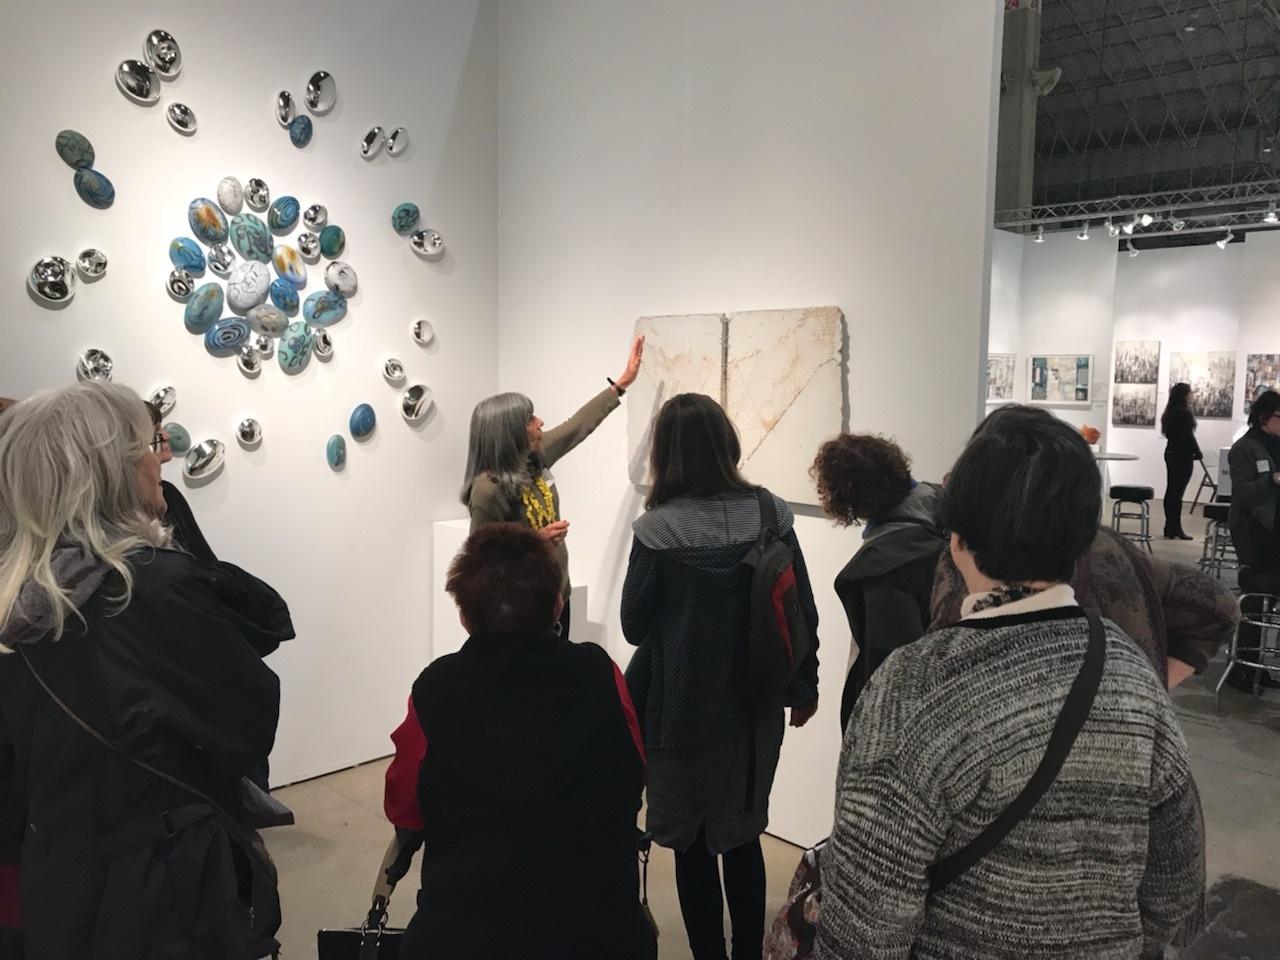 sofa art gallery ben whistler momentum at chicago 2017 2 5 november installation views